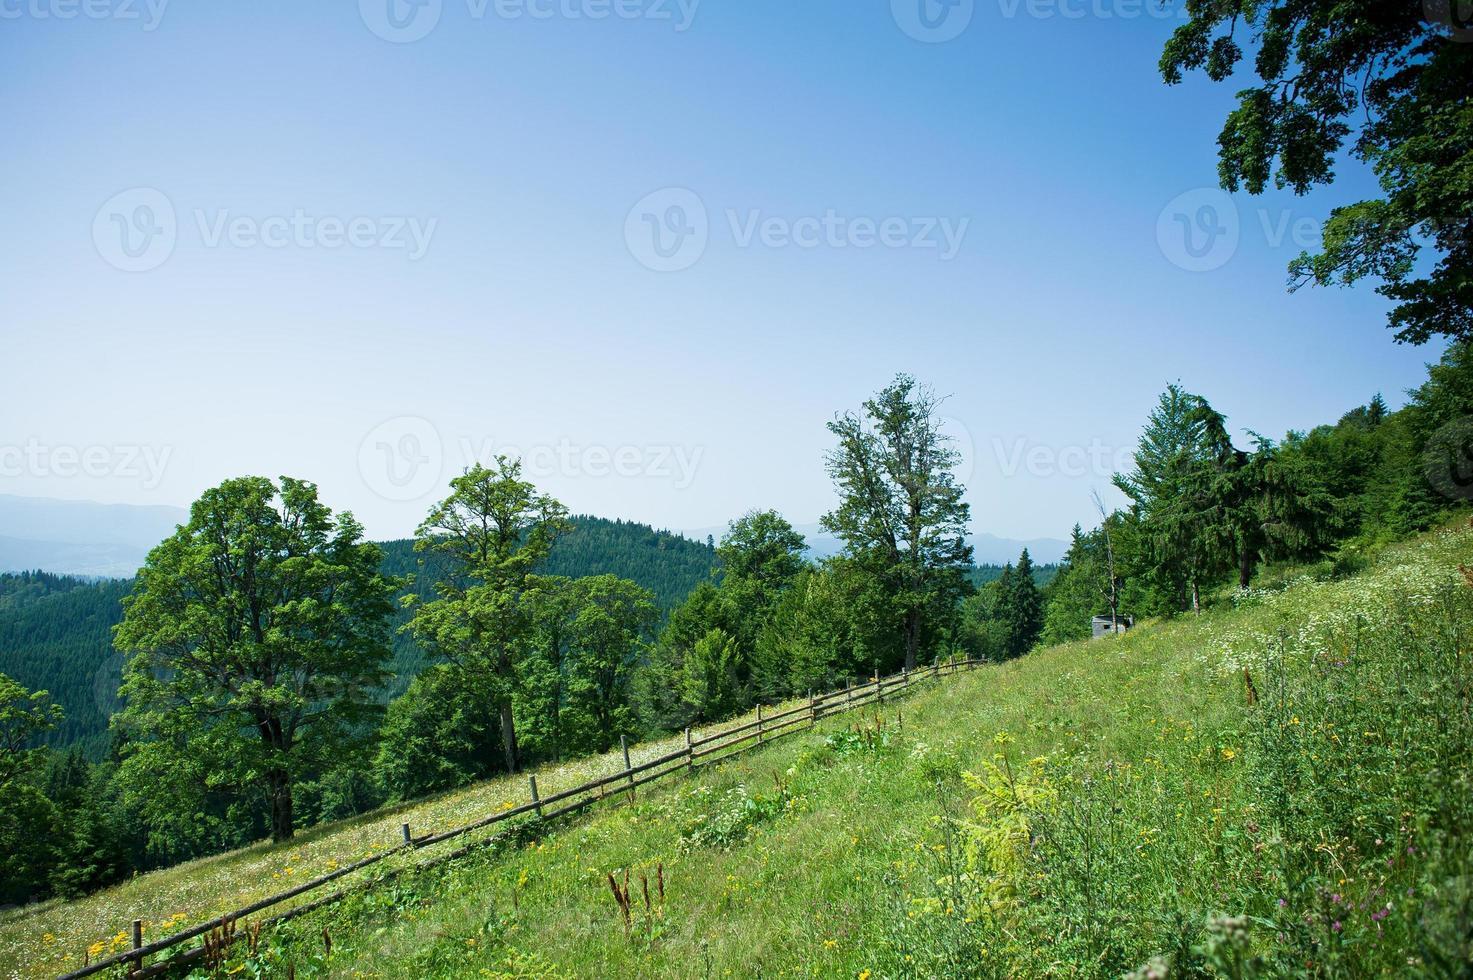 paesaggio primaverile in montagna. foto